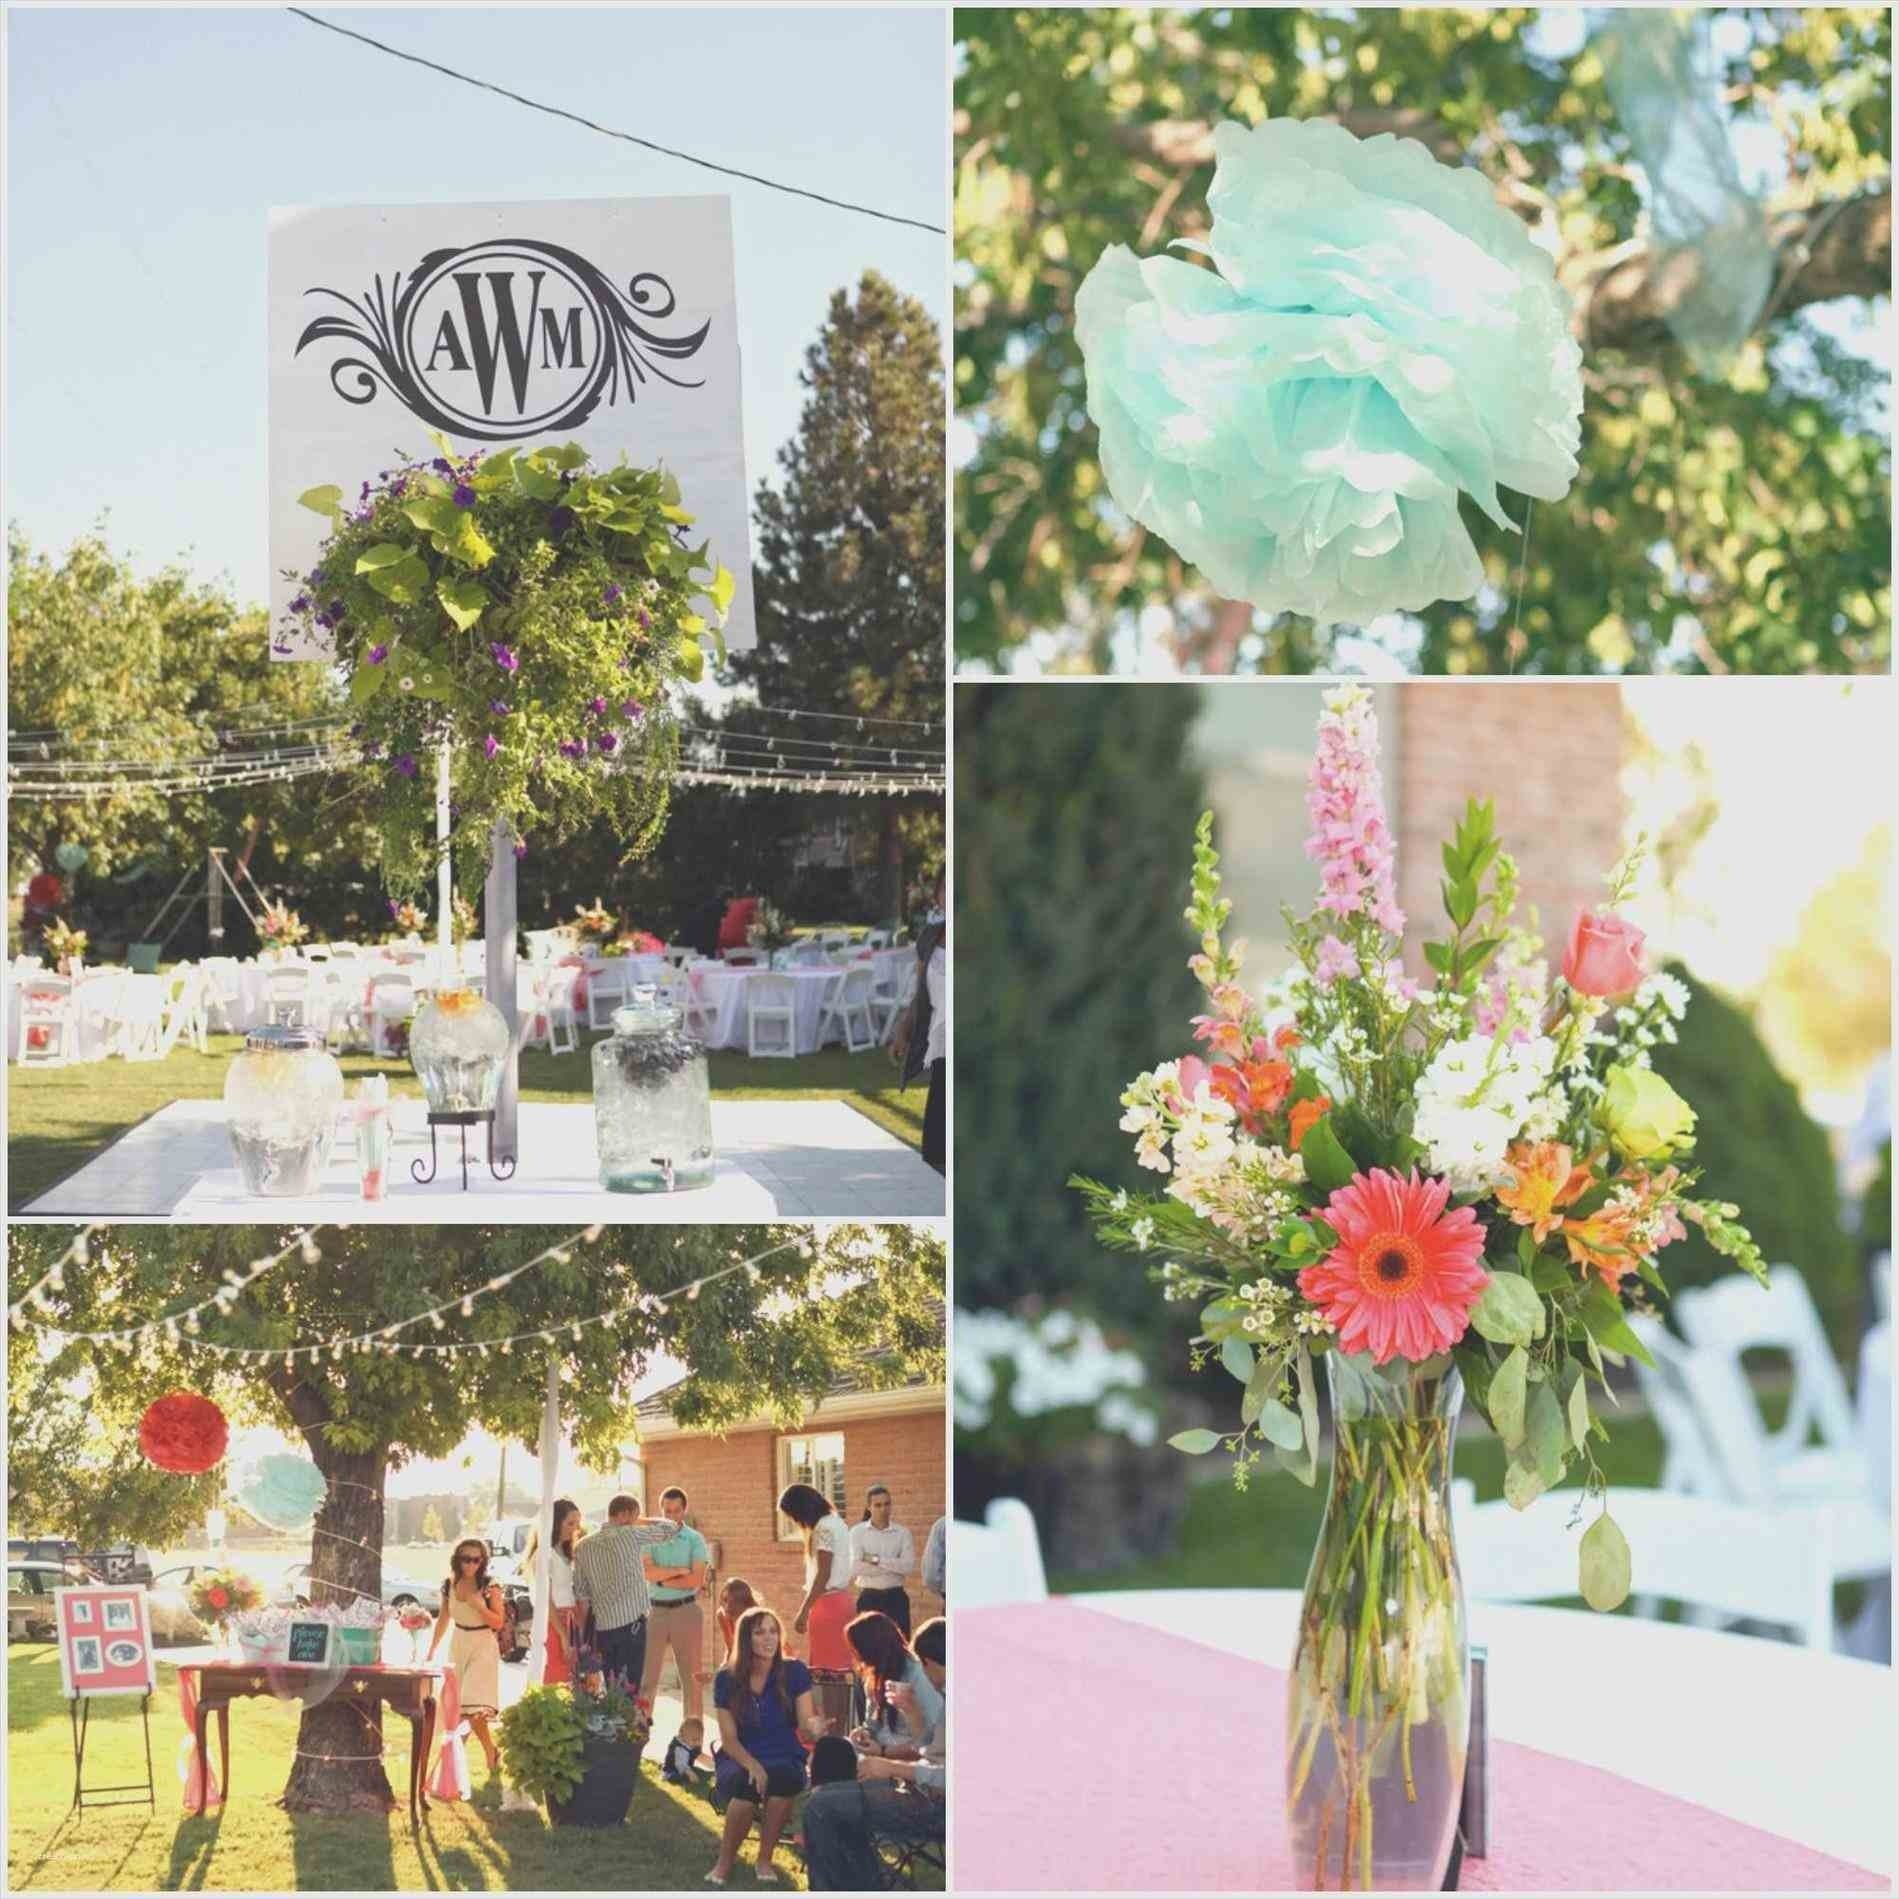 10 Fashionable Cheap Wedding Ideas For Summer 2020